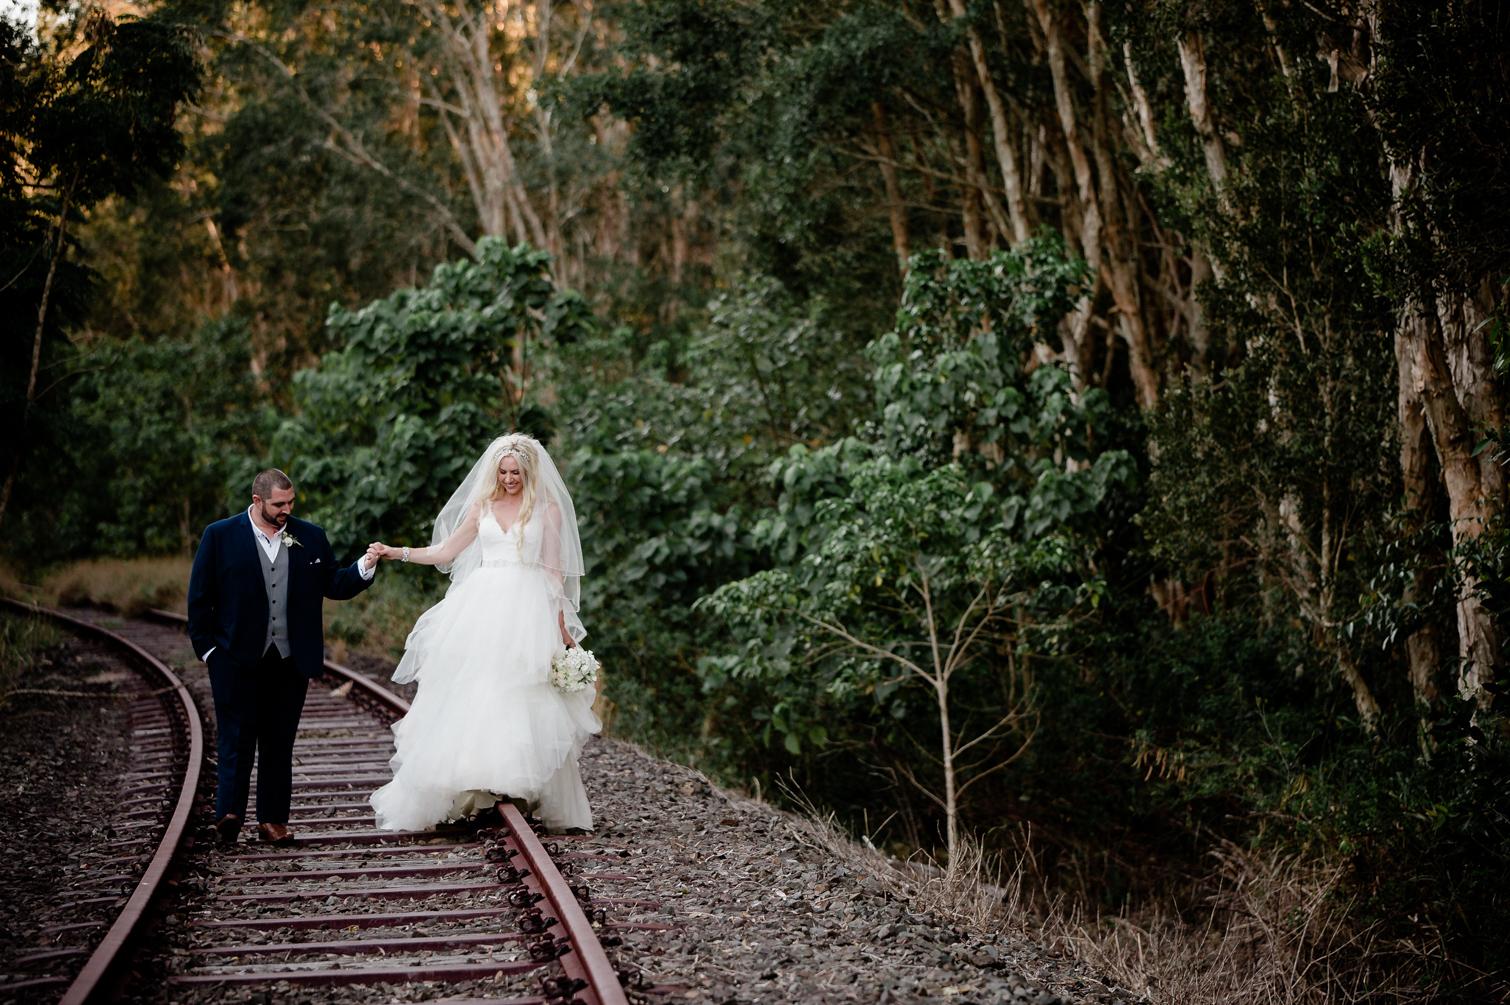 The_Belongil_Byron_Bay_Weddings_New_Black_Studios-148.jpg